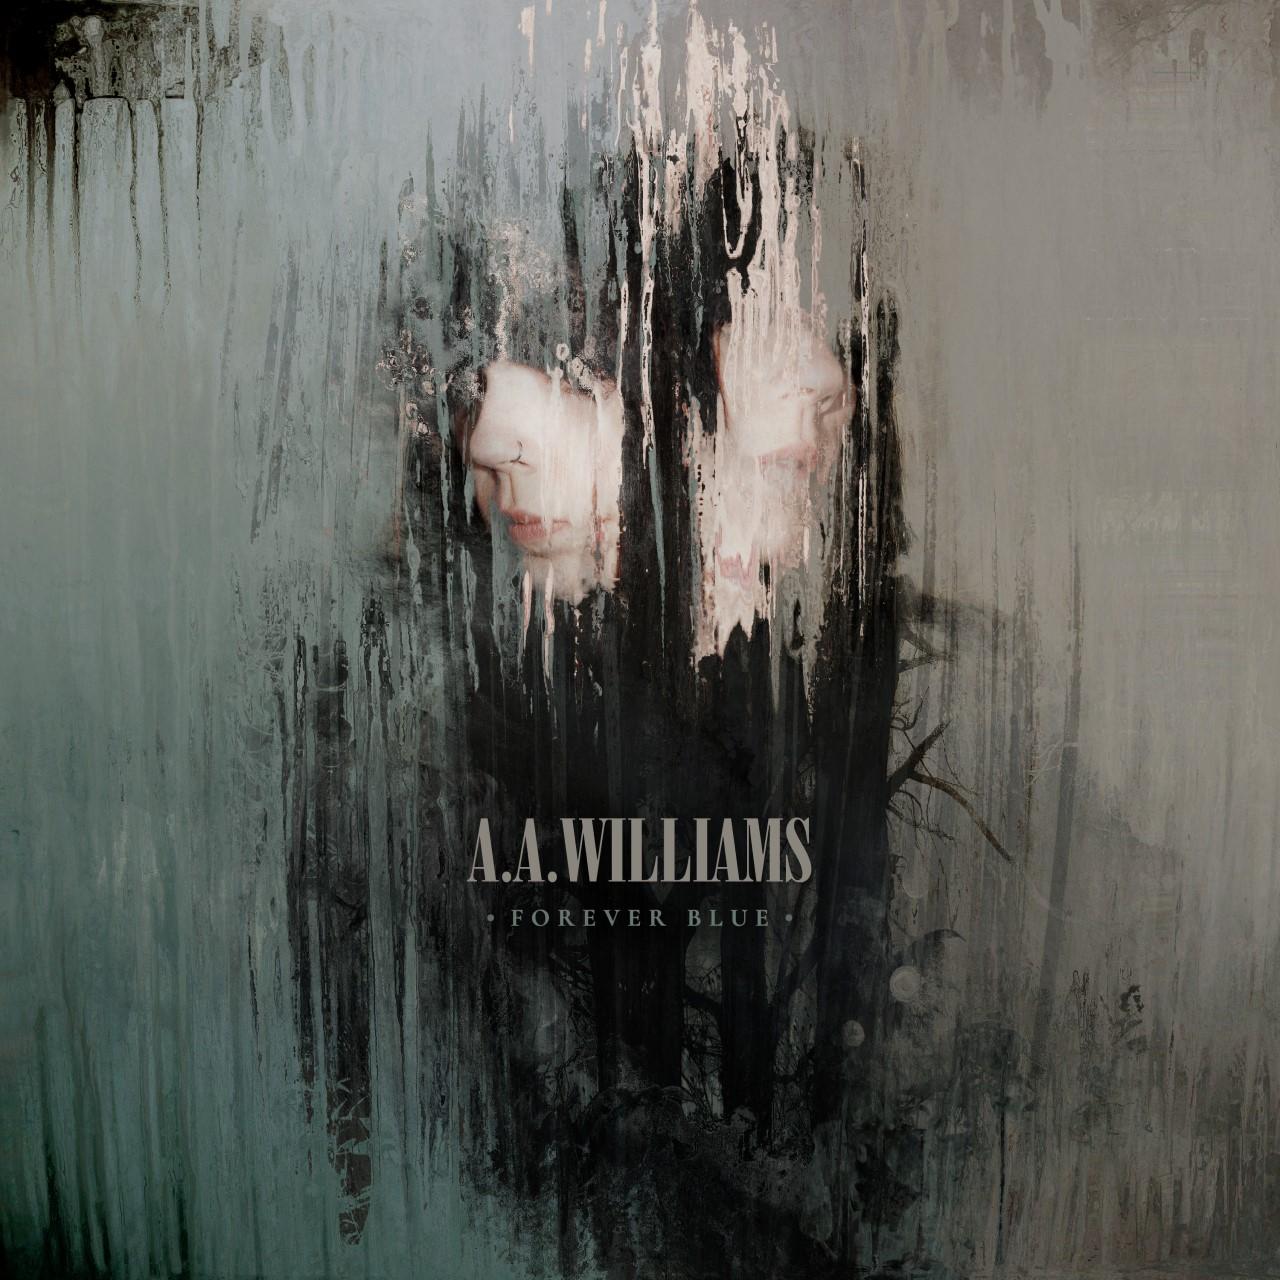 A.A.Williams